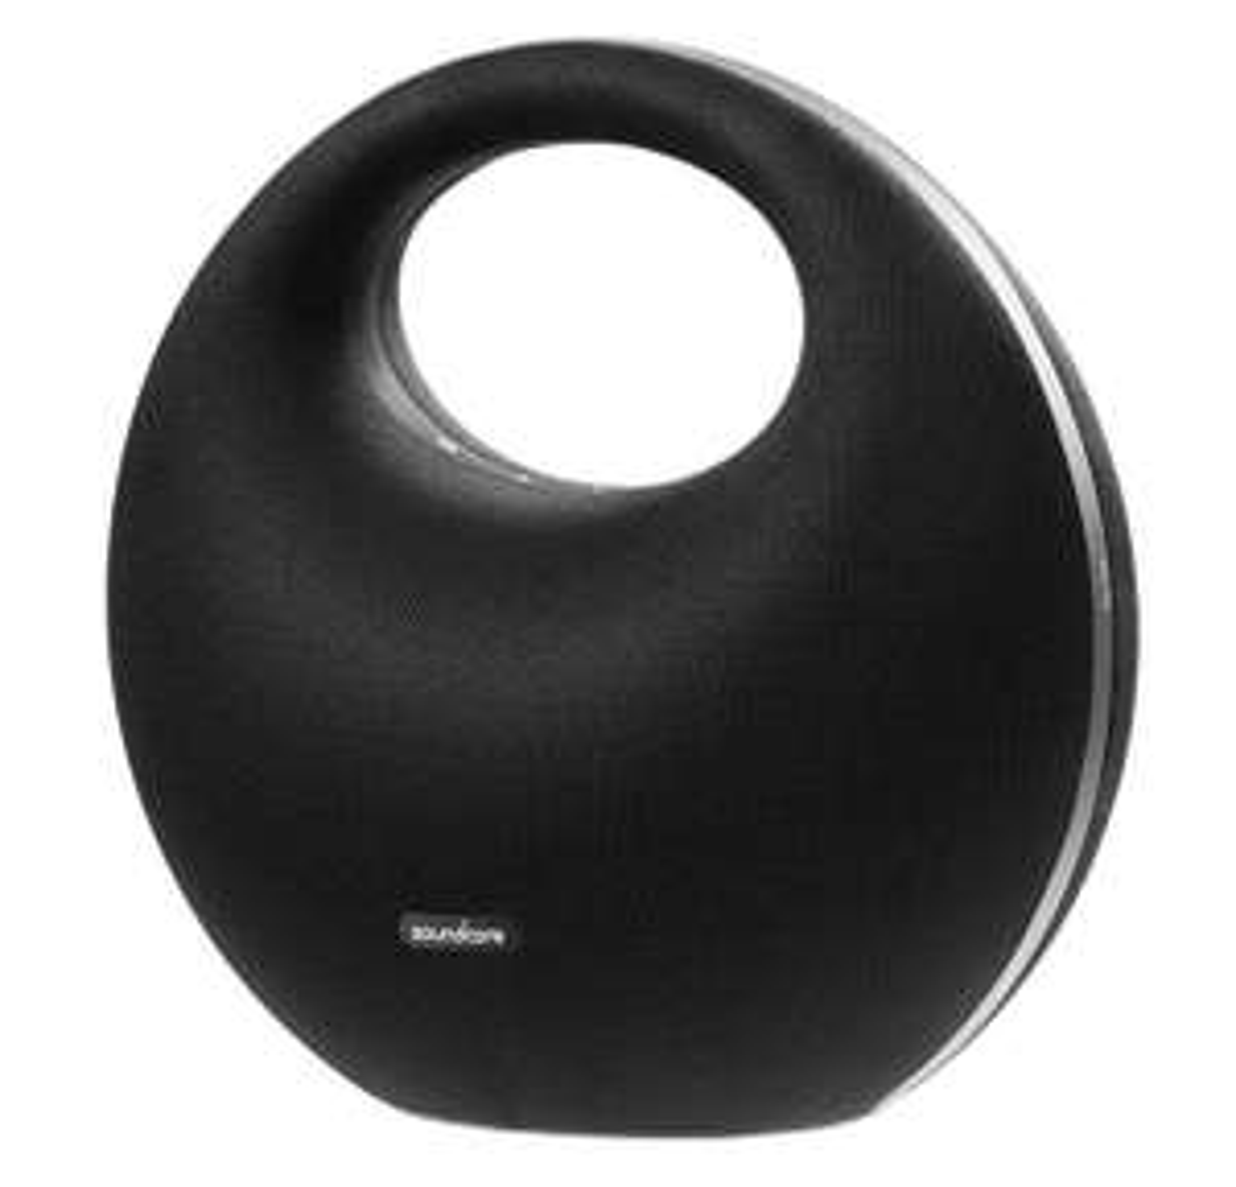 Soundcore Model Zero Bluetooth Lautsprecher.